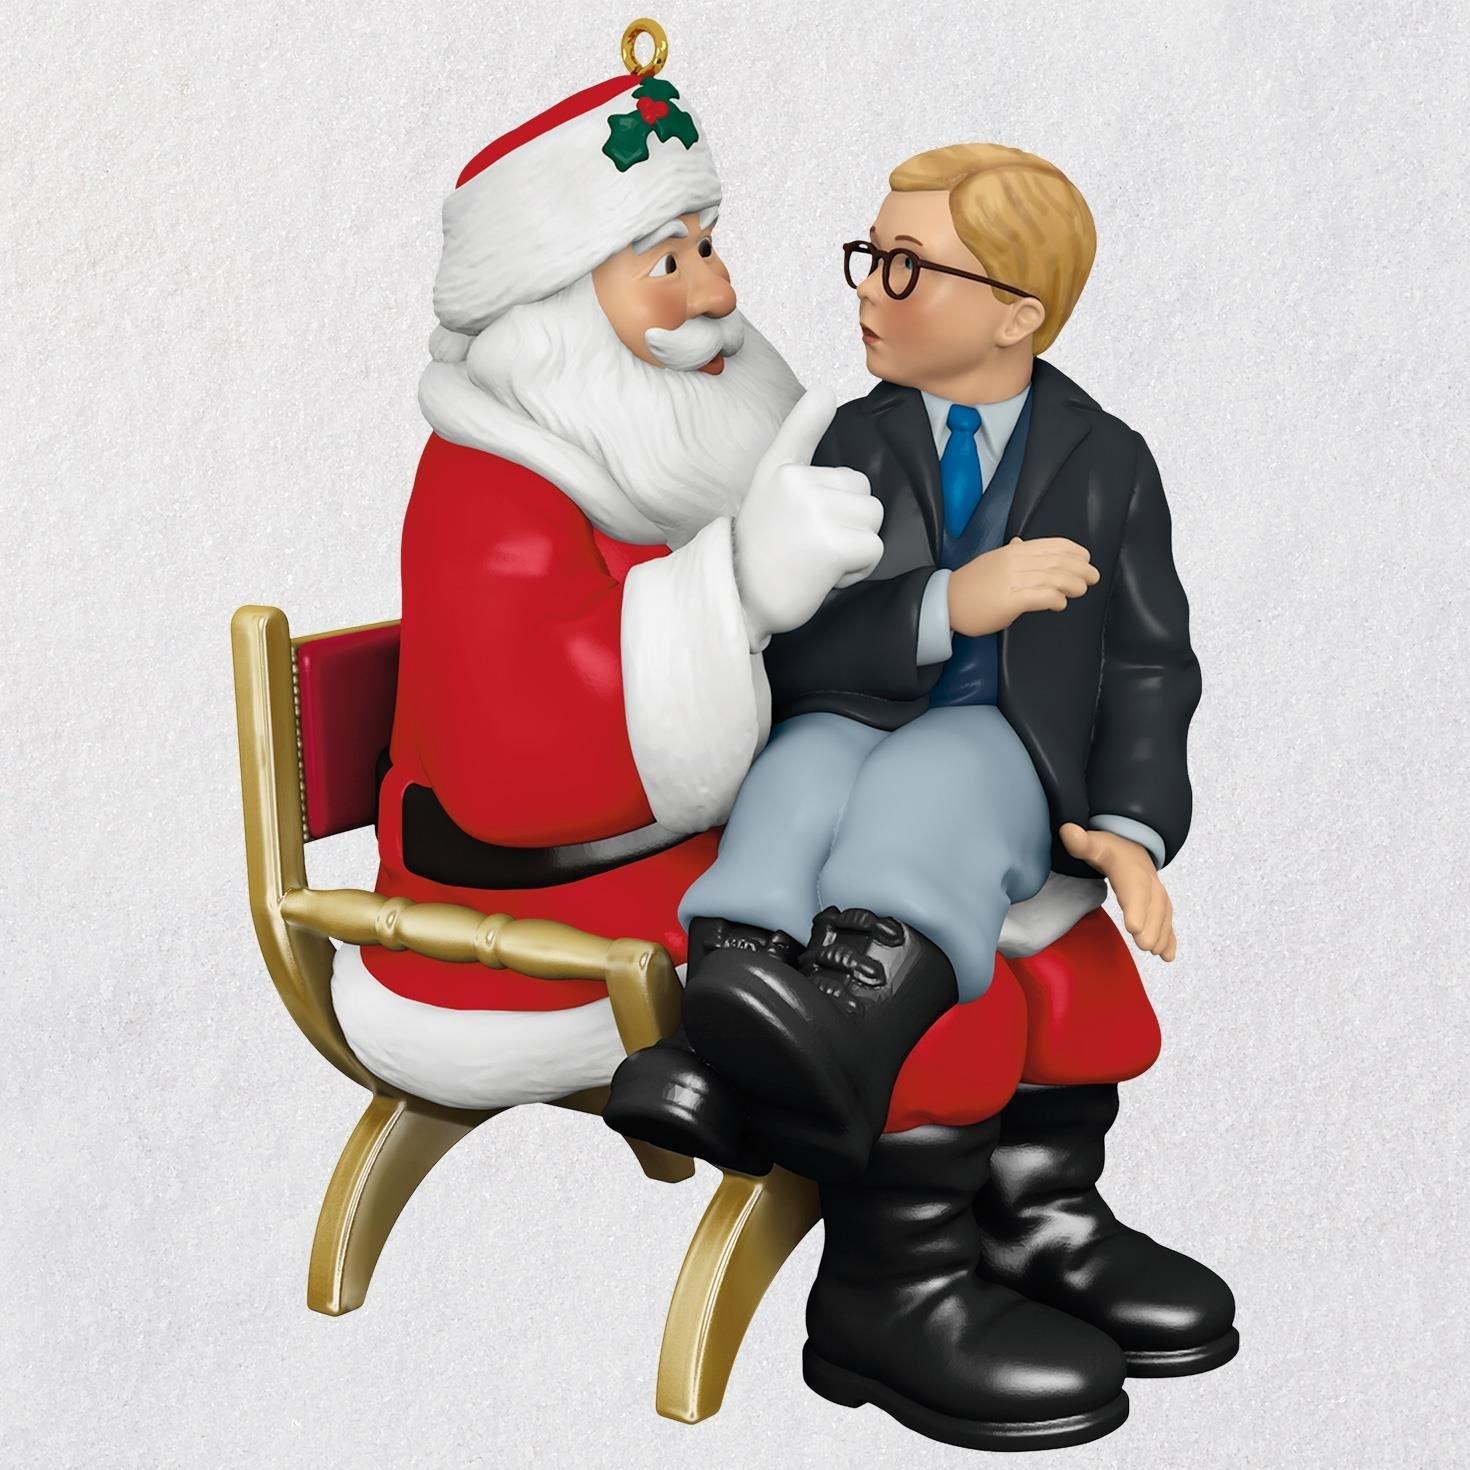 Hallmark A Christmas Story Ho! Ho! Ho! Ornament With Sound keepsake-ornaments Movies & TV,Santa Claus